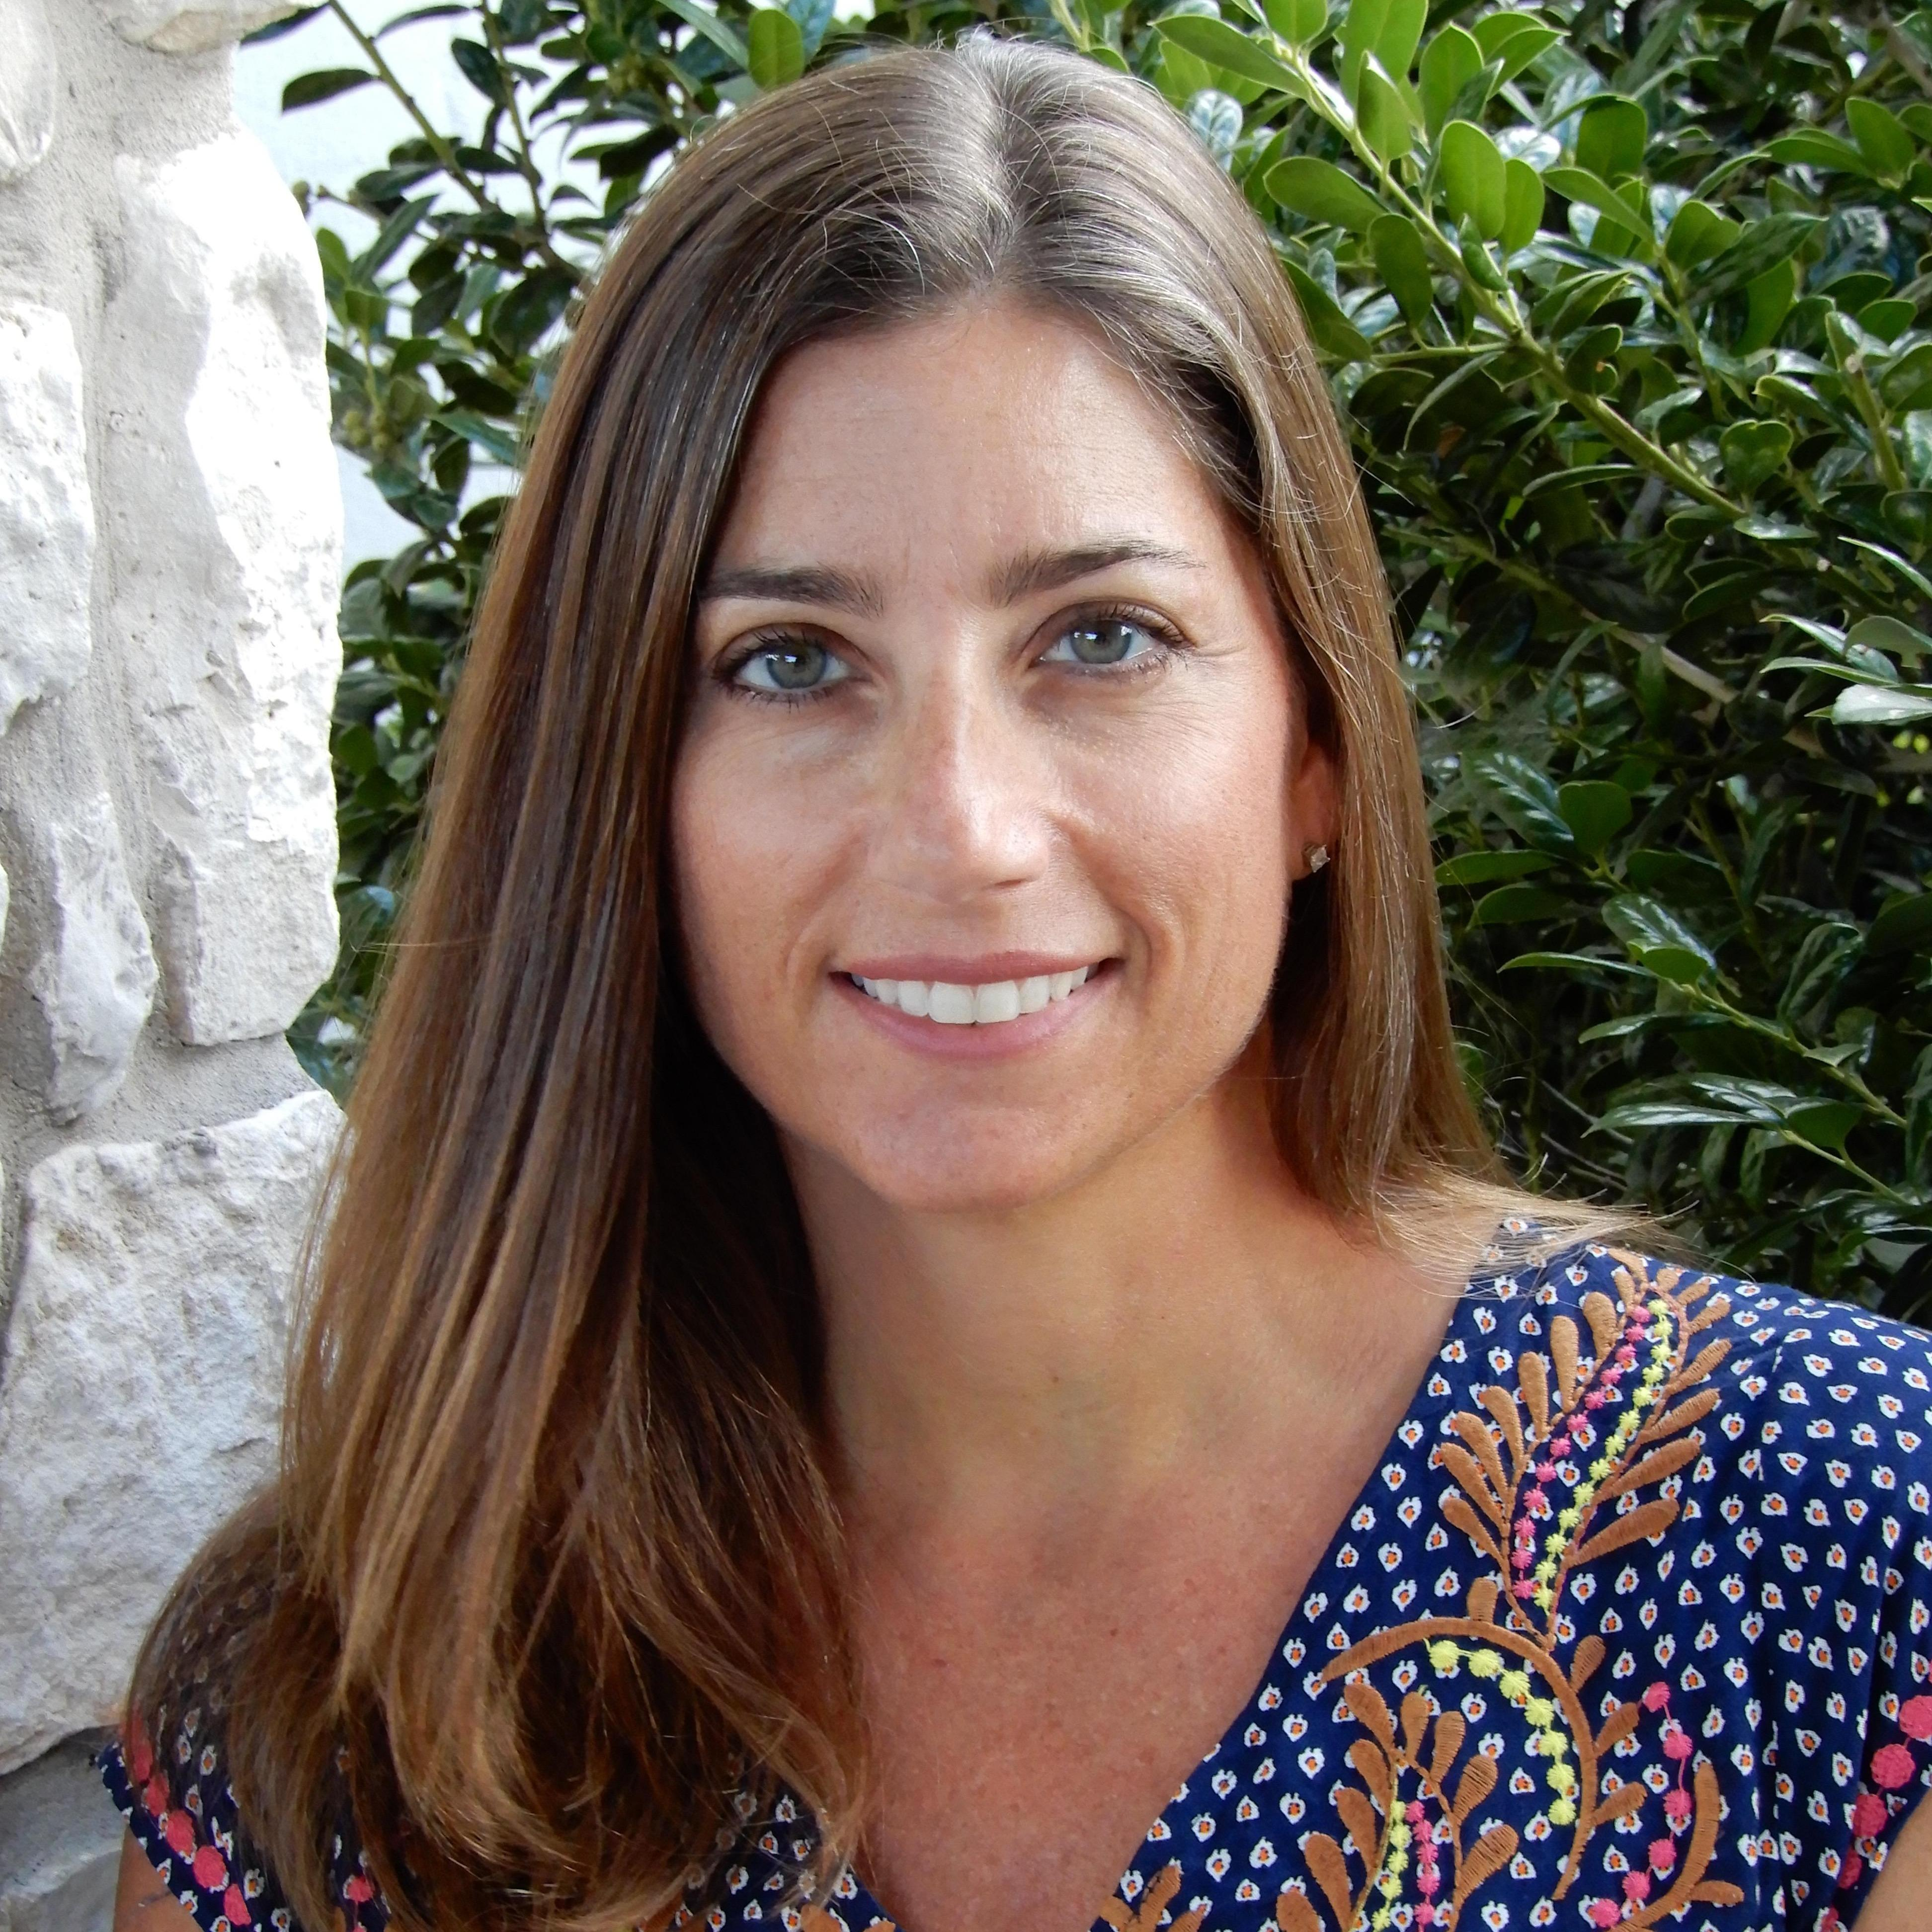 Melanie Van Maren's Profile Photo